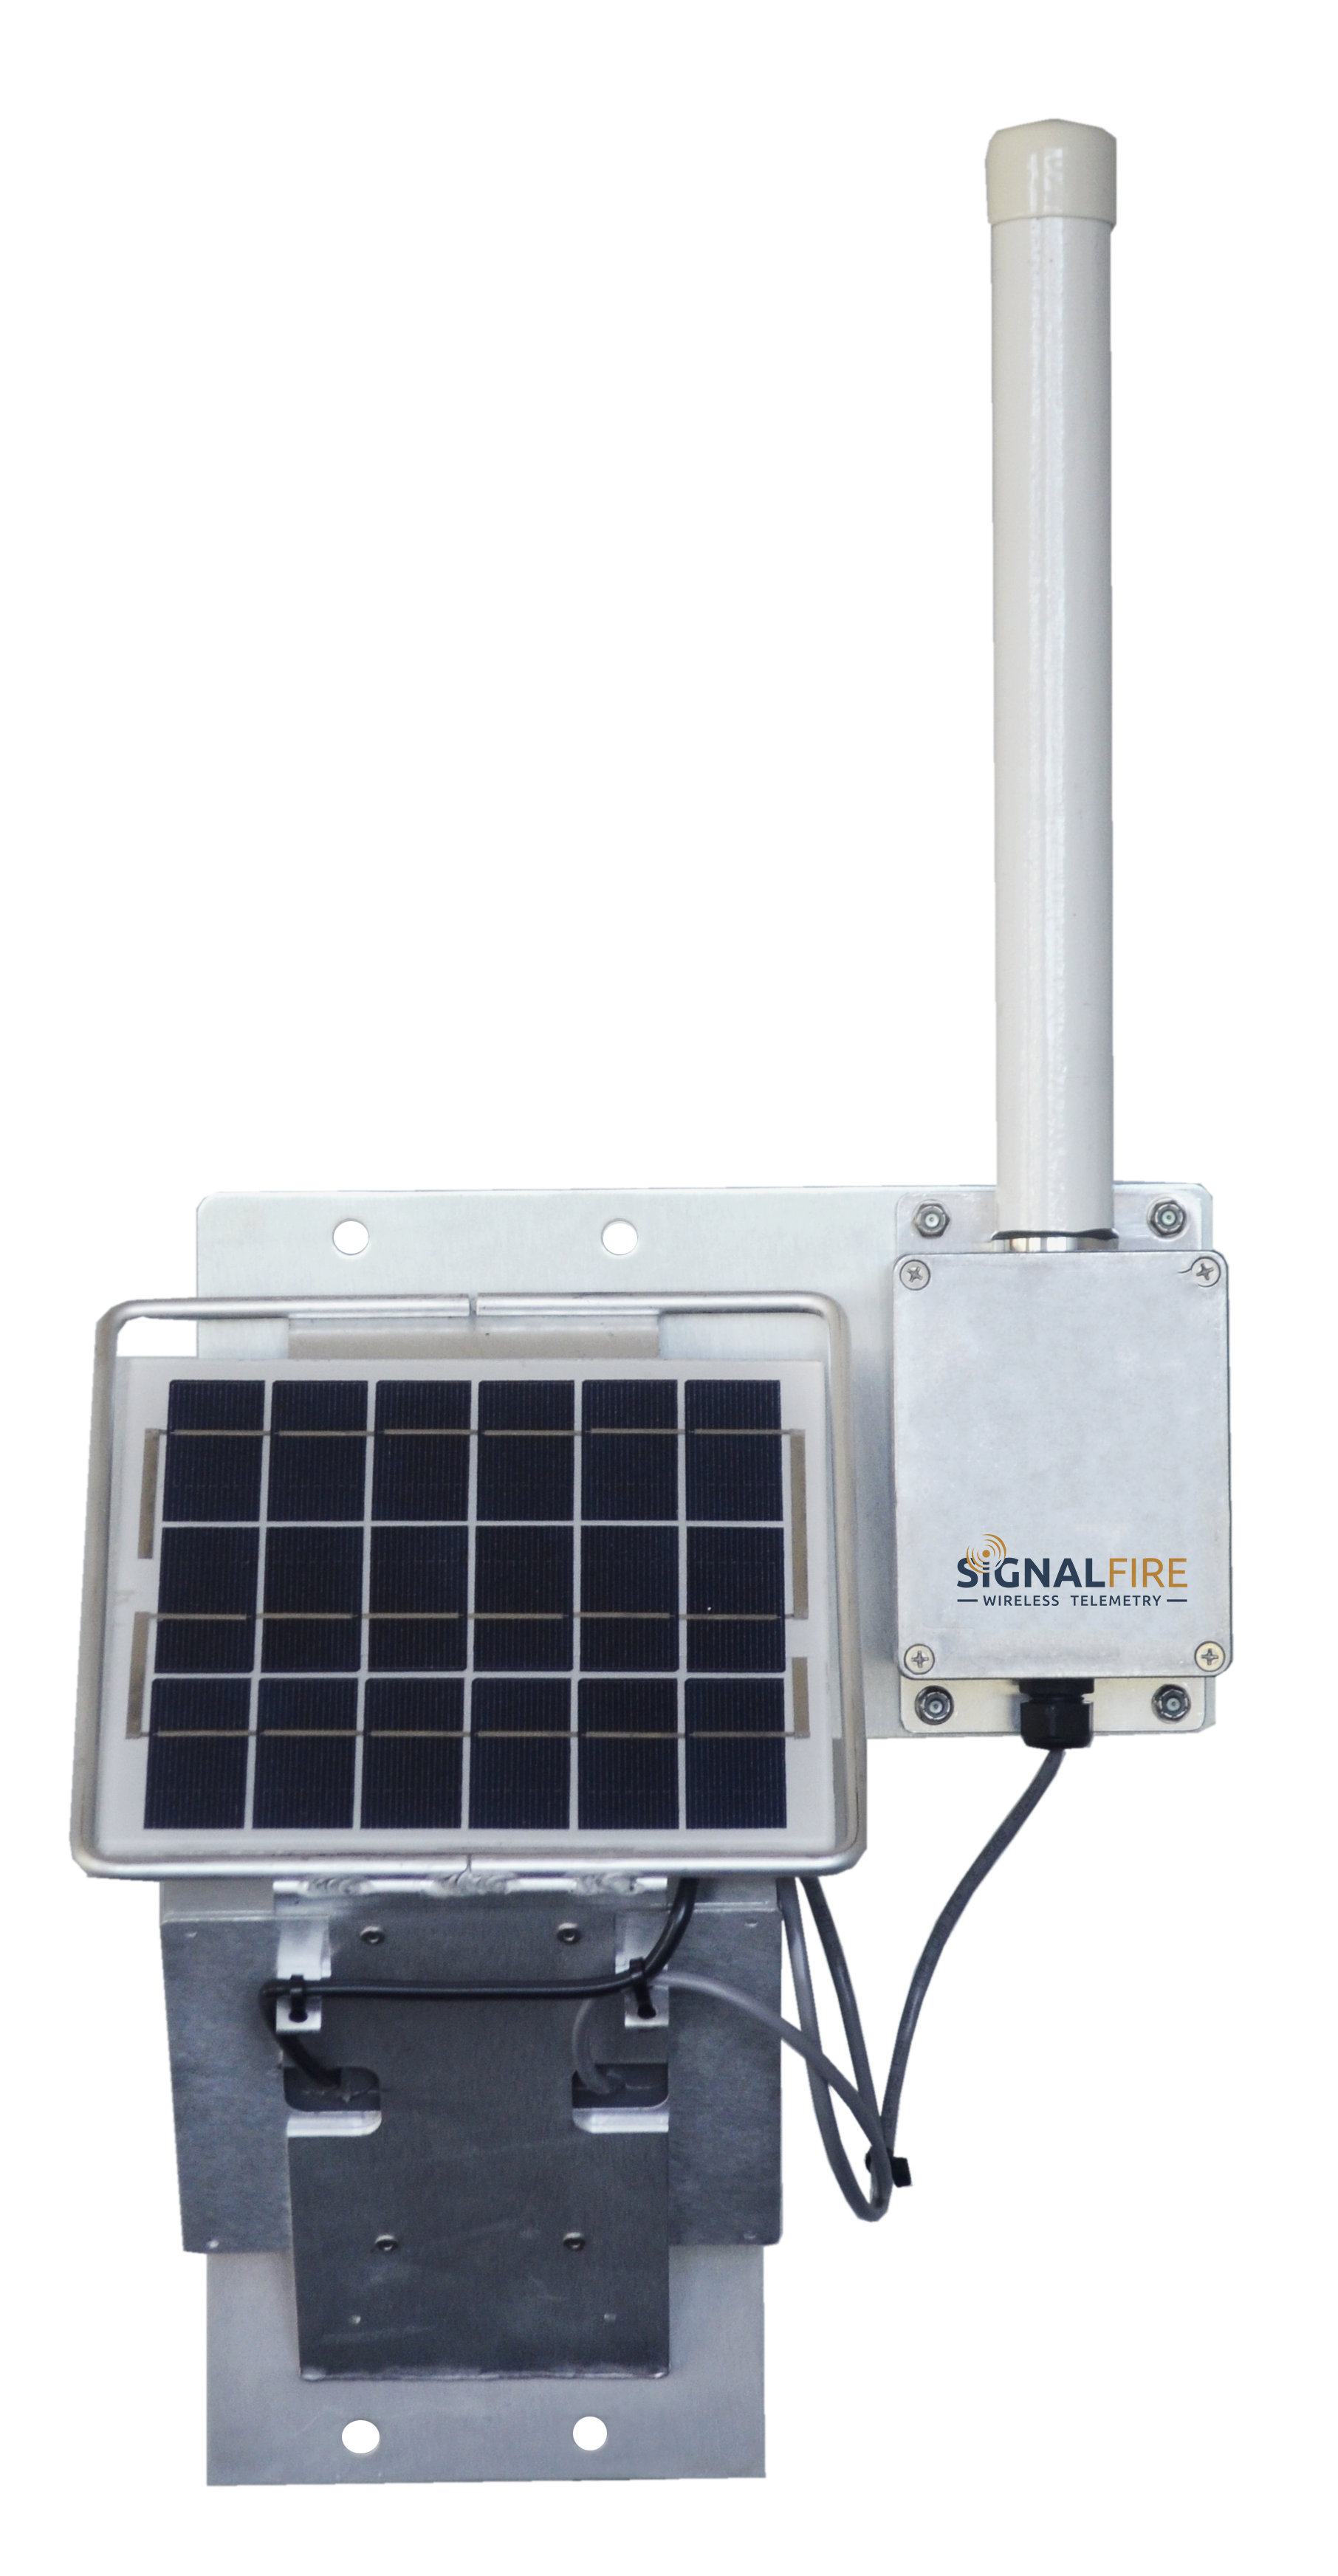 Repeater Node Extends Signalfire Wireless Network